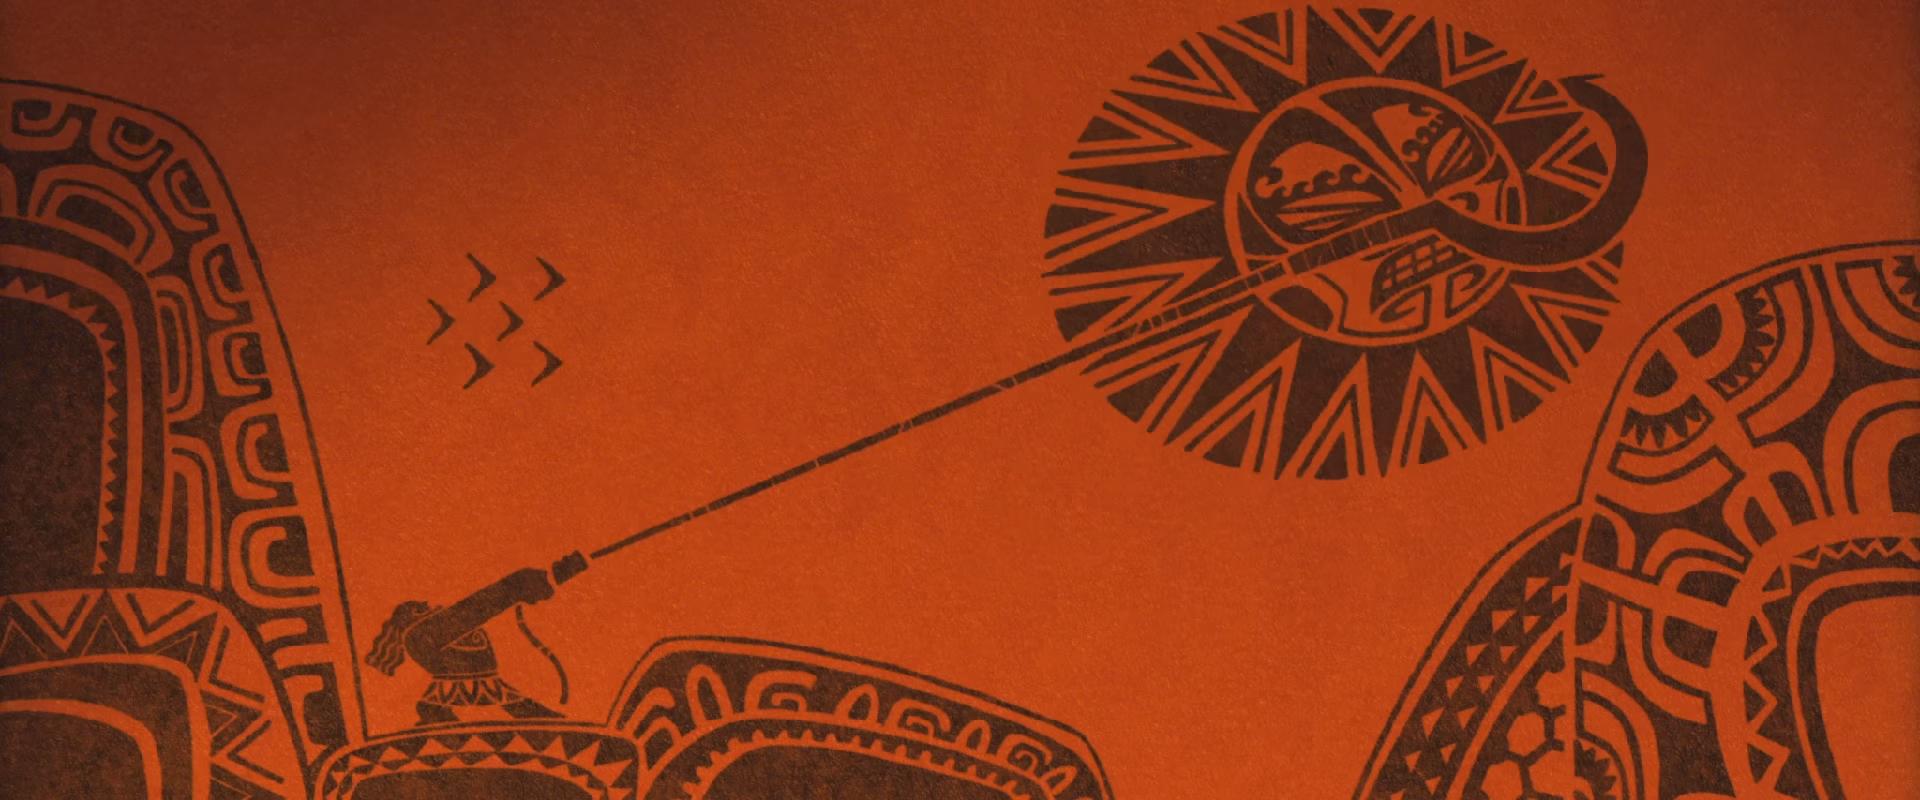 Image moana maui tattoo disney wiki fandom for Maui tattoo stencil